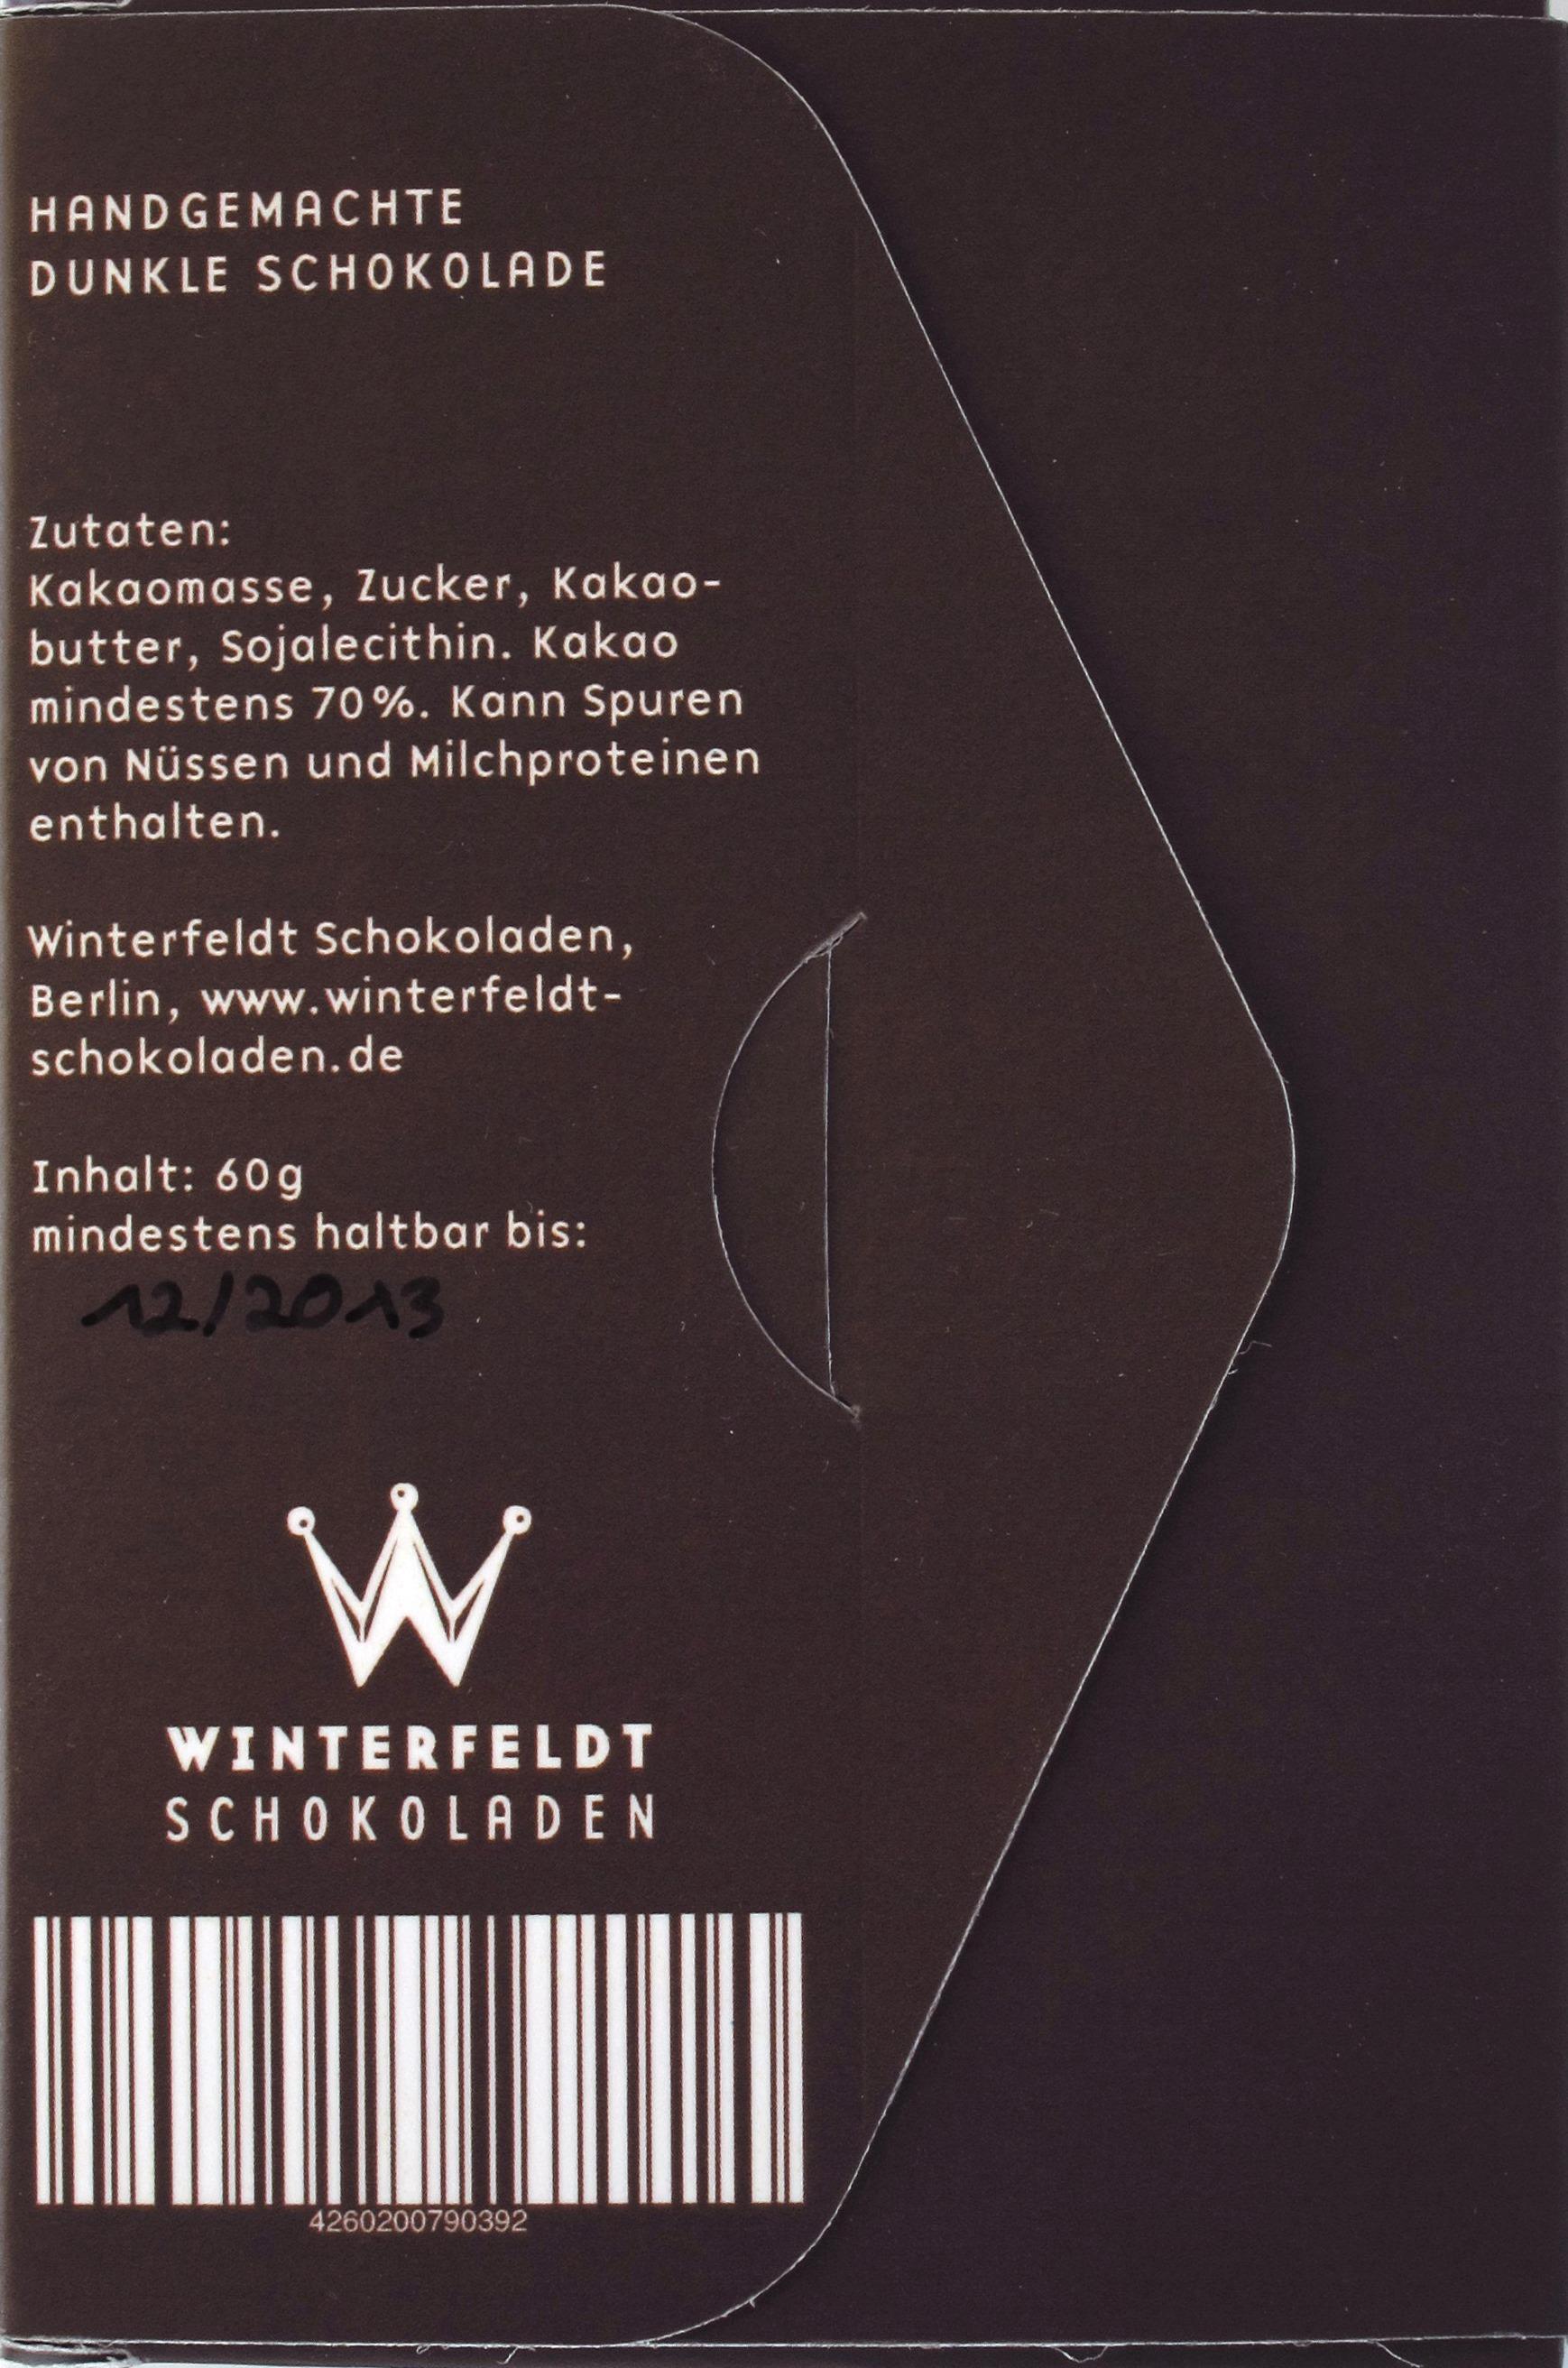 Winterfeldt 70%-Schokolade, Rückseite